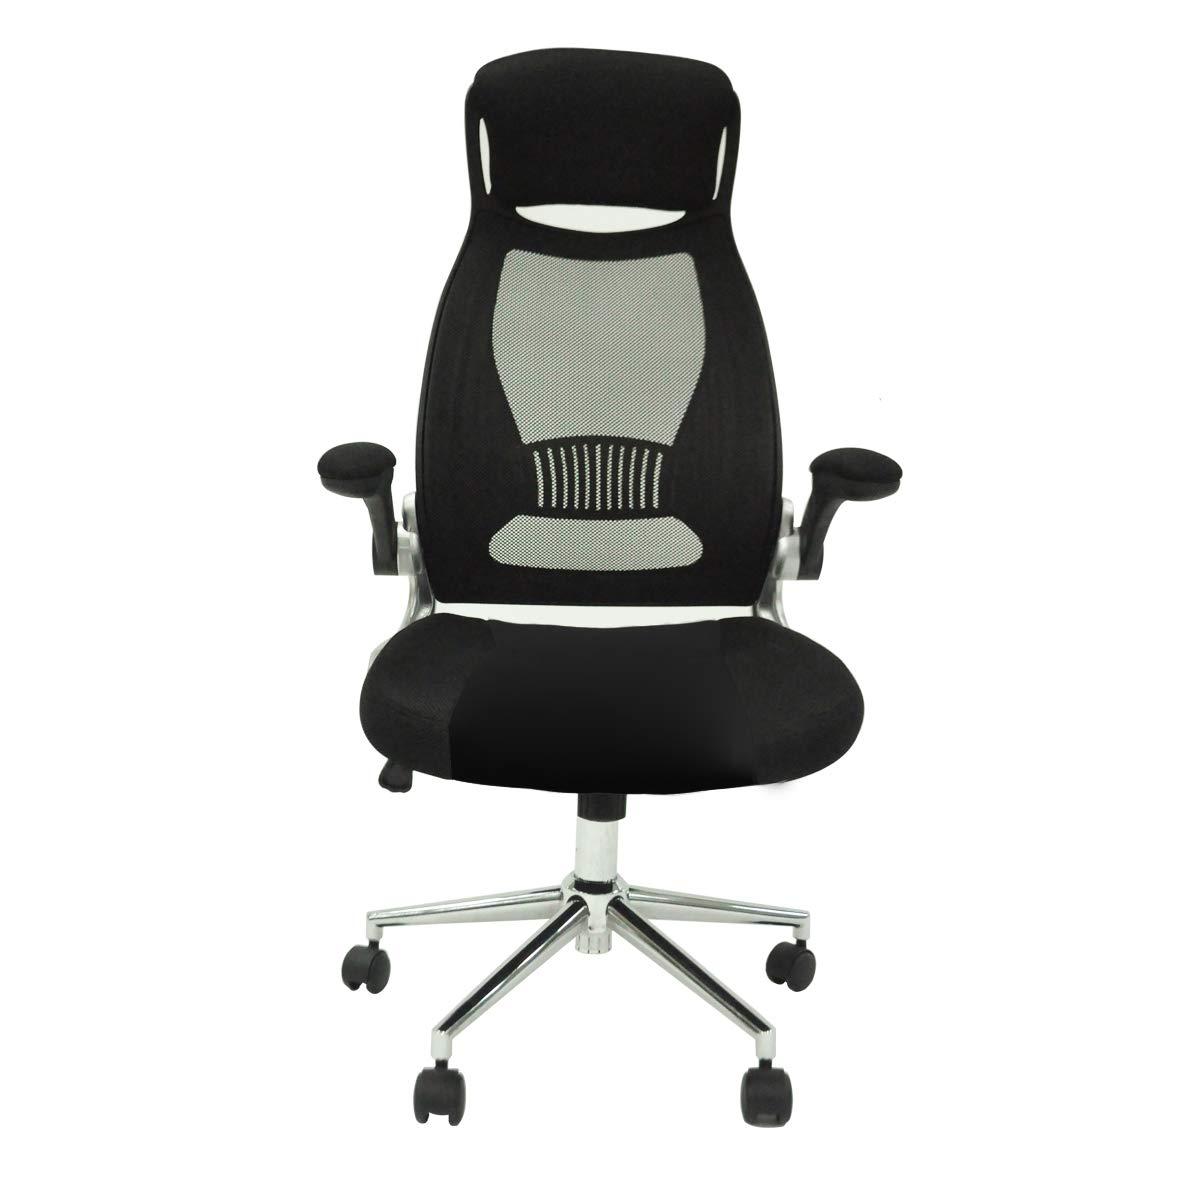 Mesh Computer Office Chair High Back Ergonomic Desk Chair Swivel Executive 26BK (Black)